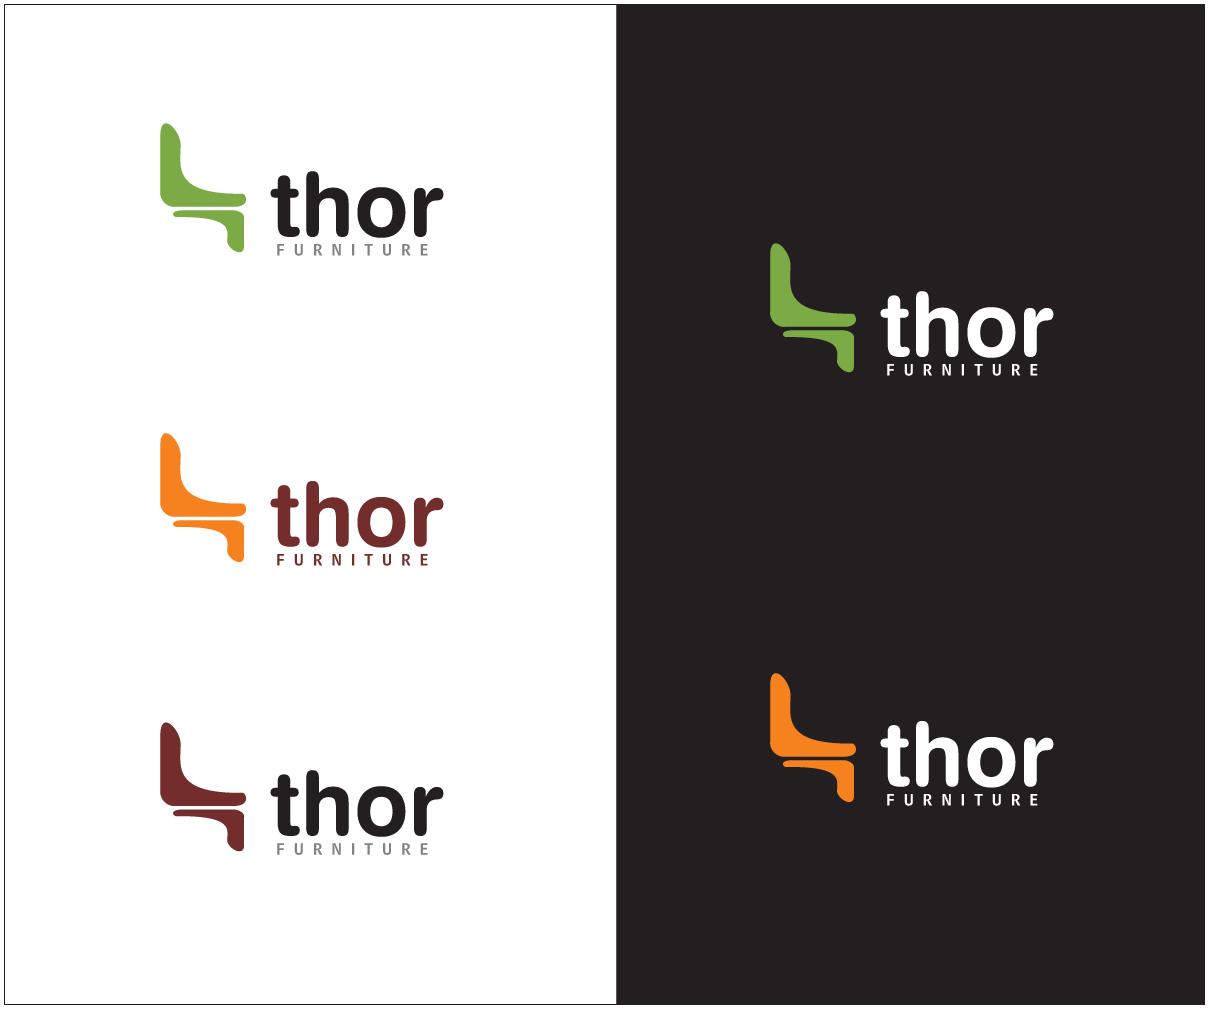 Furniture logo design png - Logo Design By Bijuak For Thor Furniture Division Of Thor Enterprises In Arizona Needs